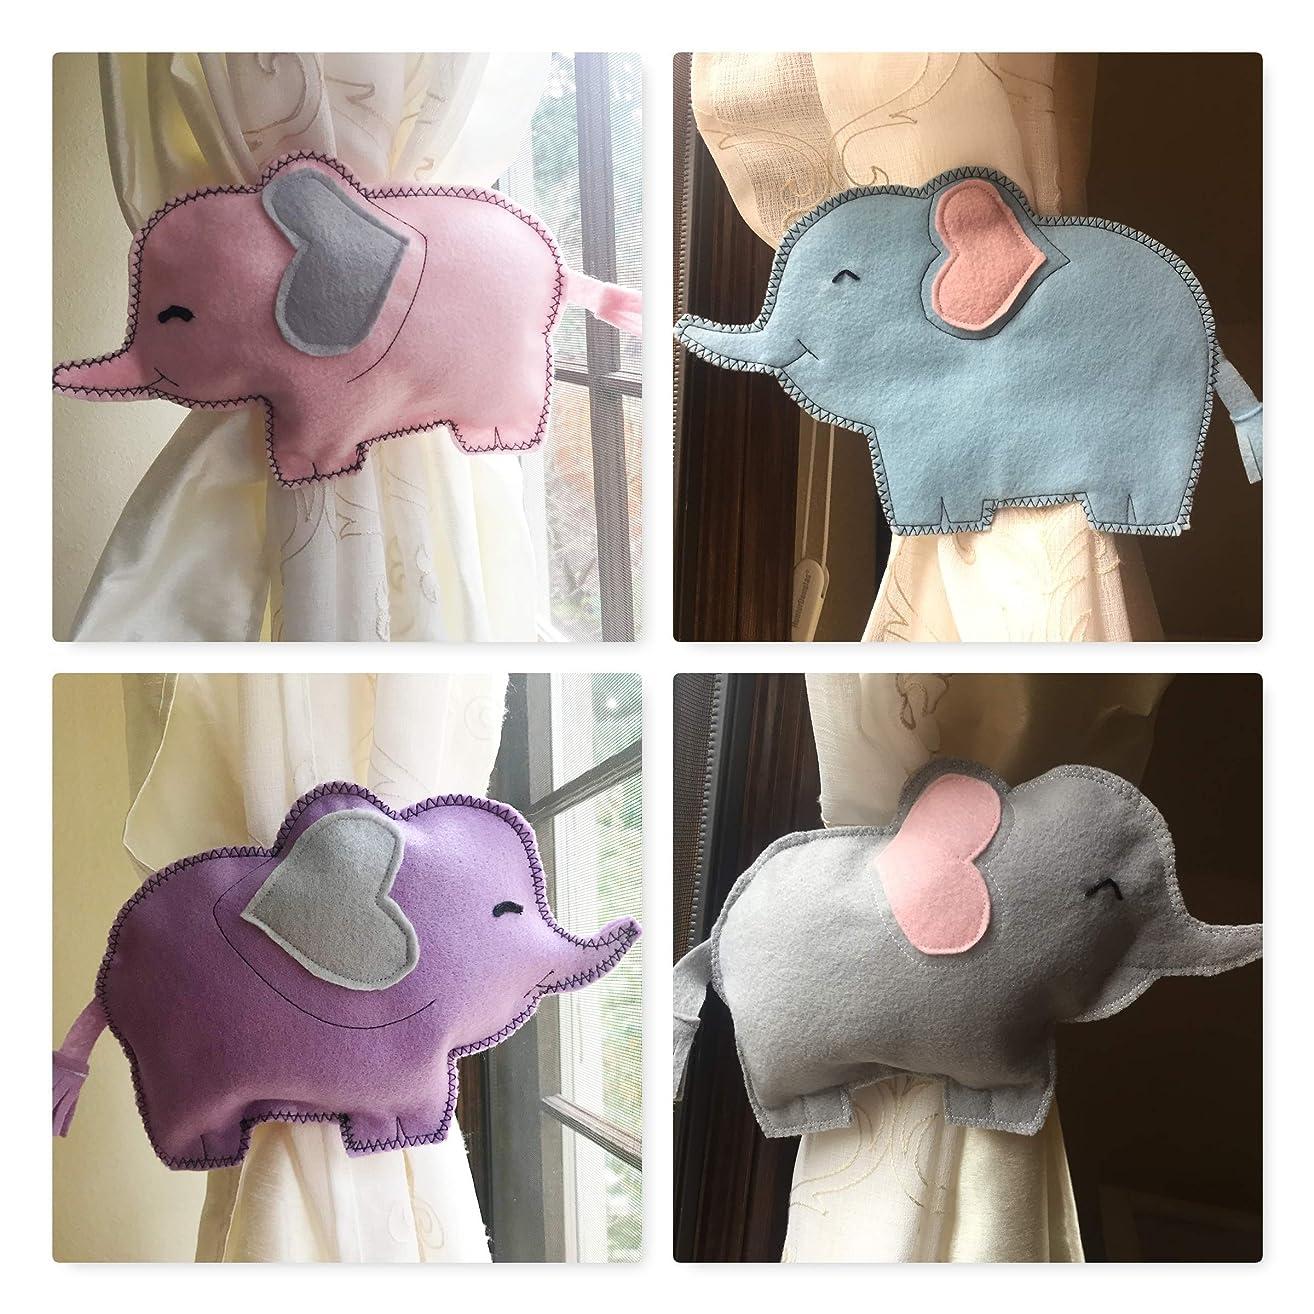 Baby Elephant curtain tieback, Kids bedroom decoration, Animal Theme room decor, pick colors, Kid Gift Present